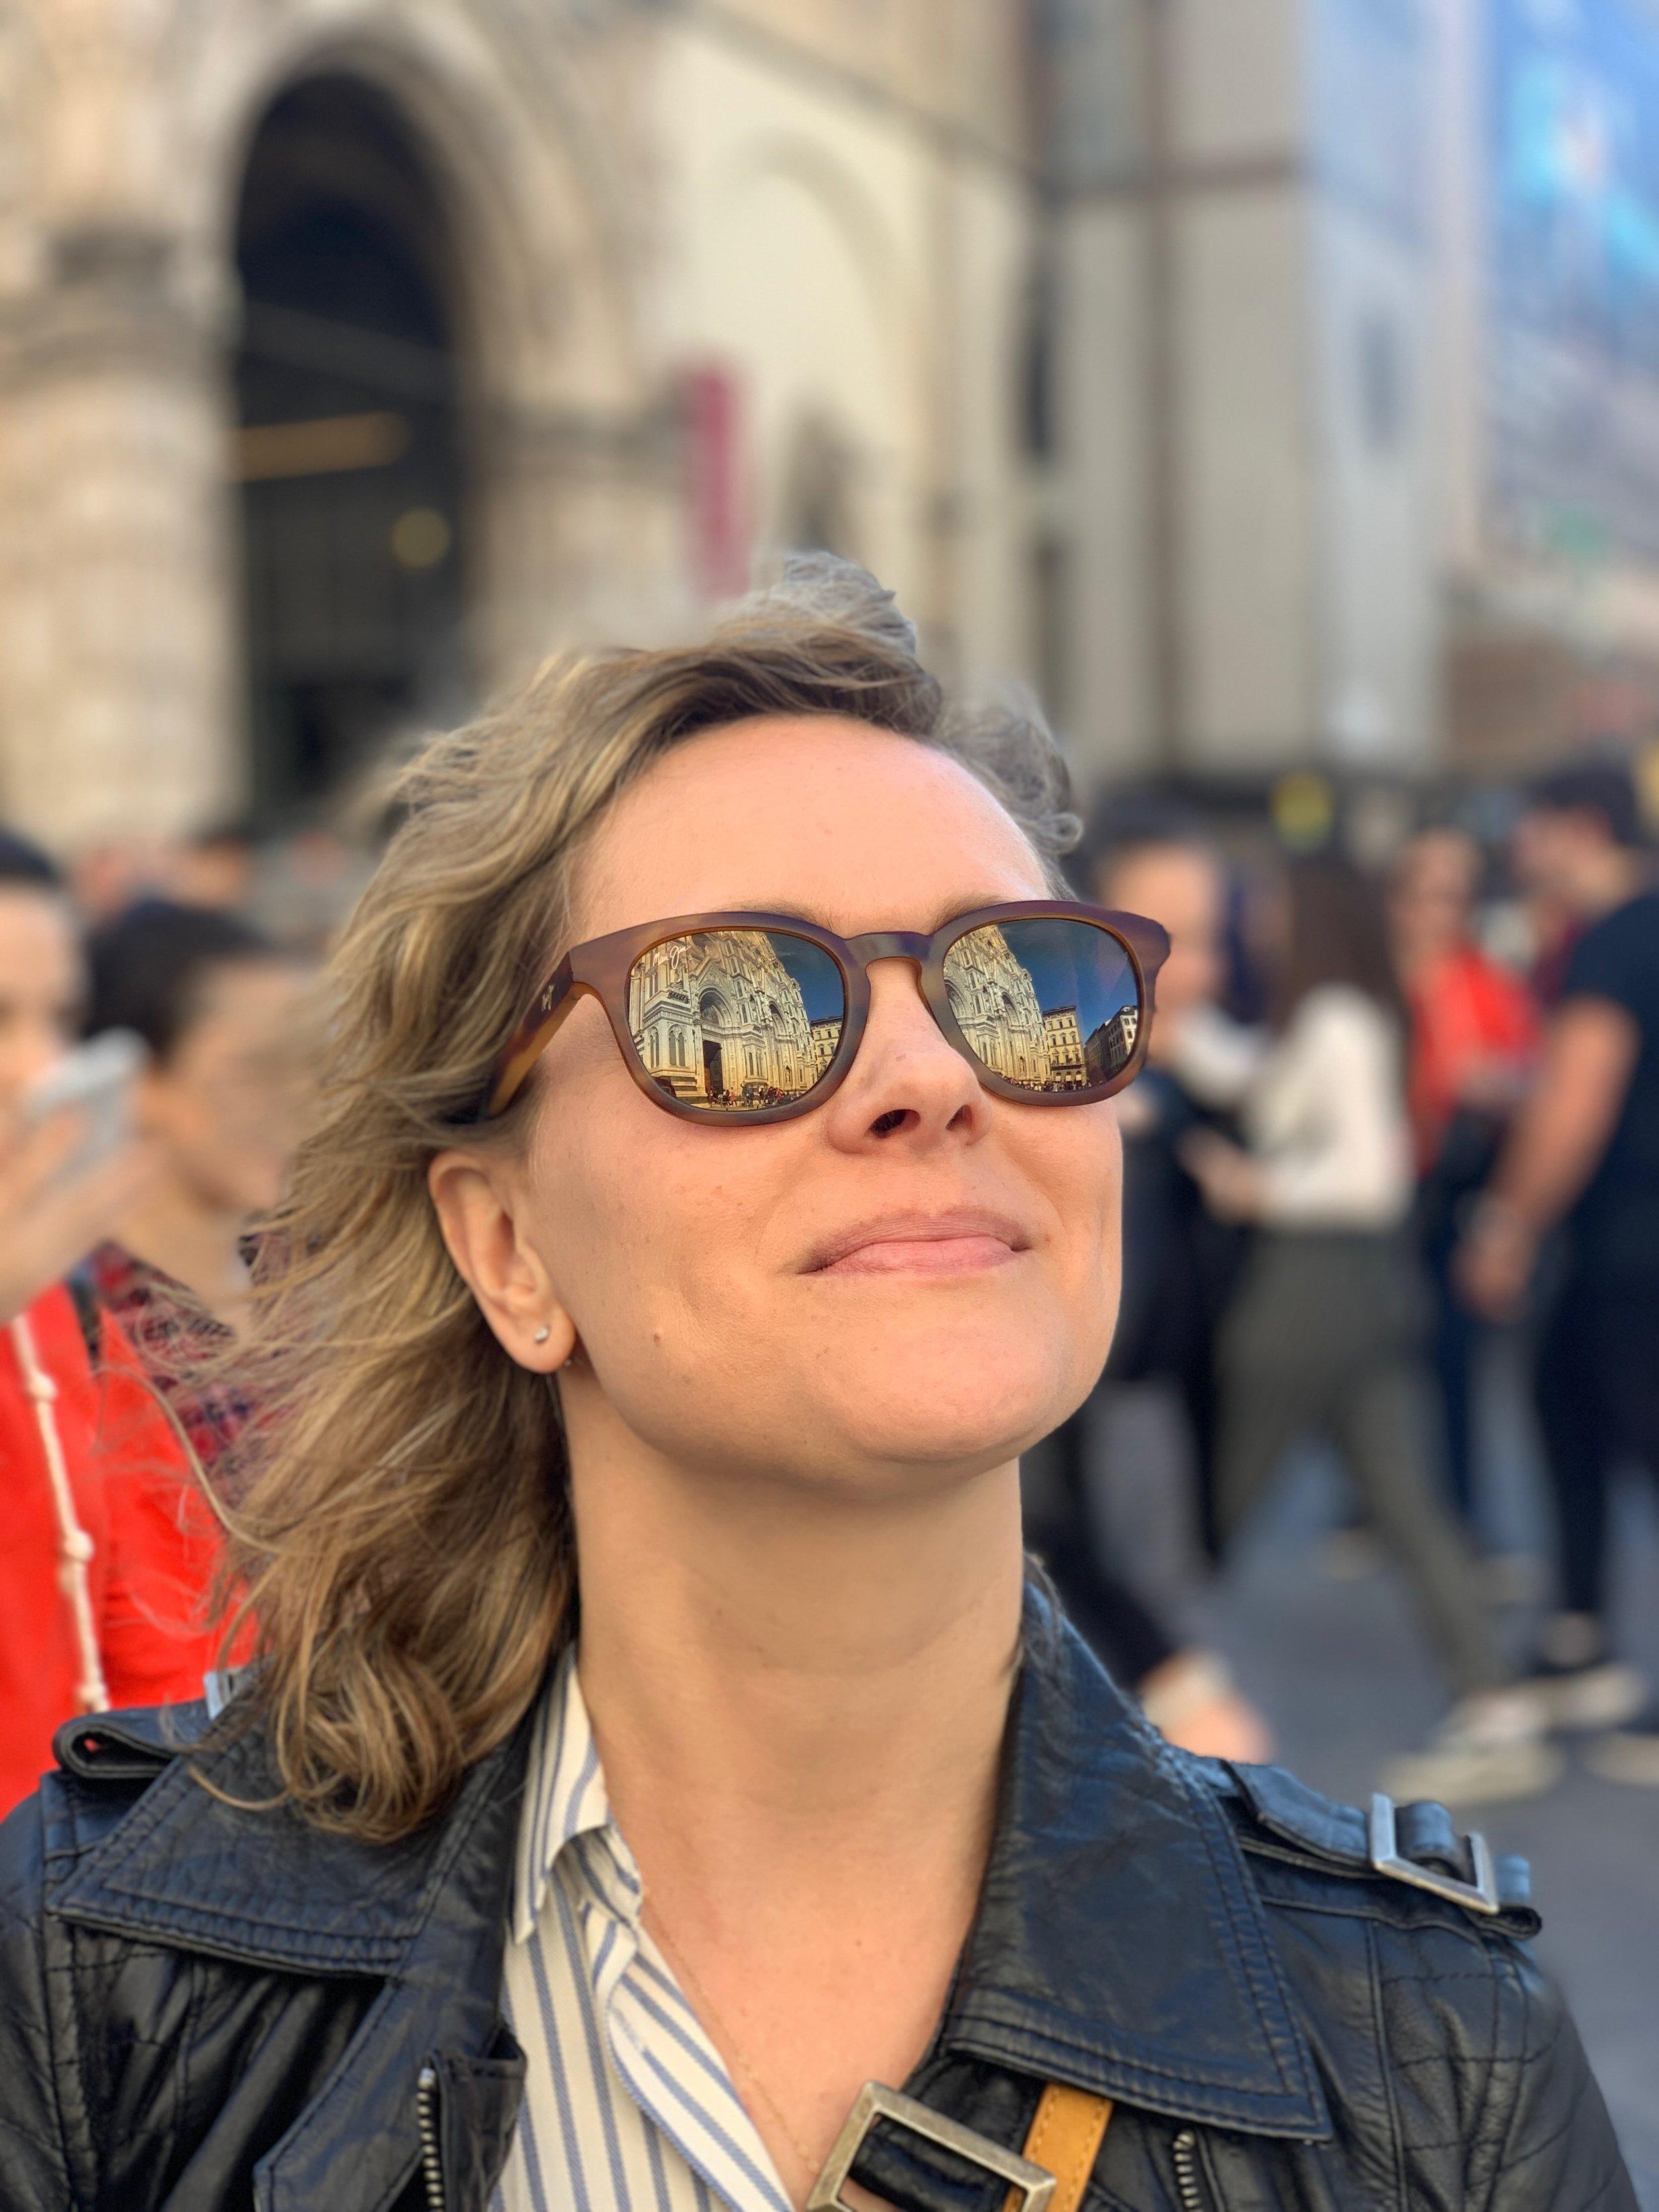 Duomo Travel Guide